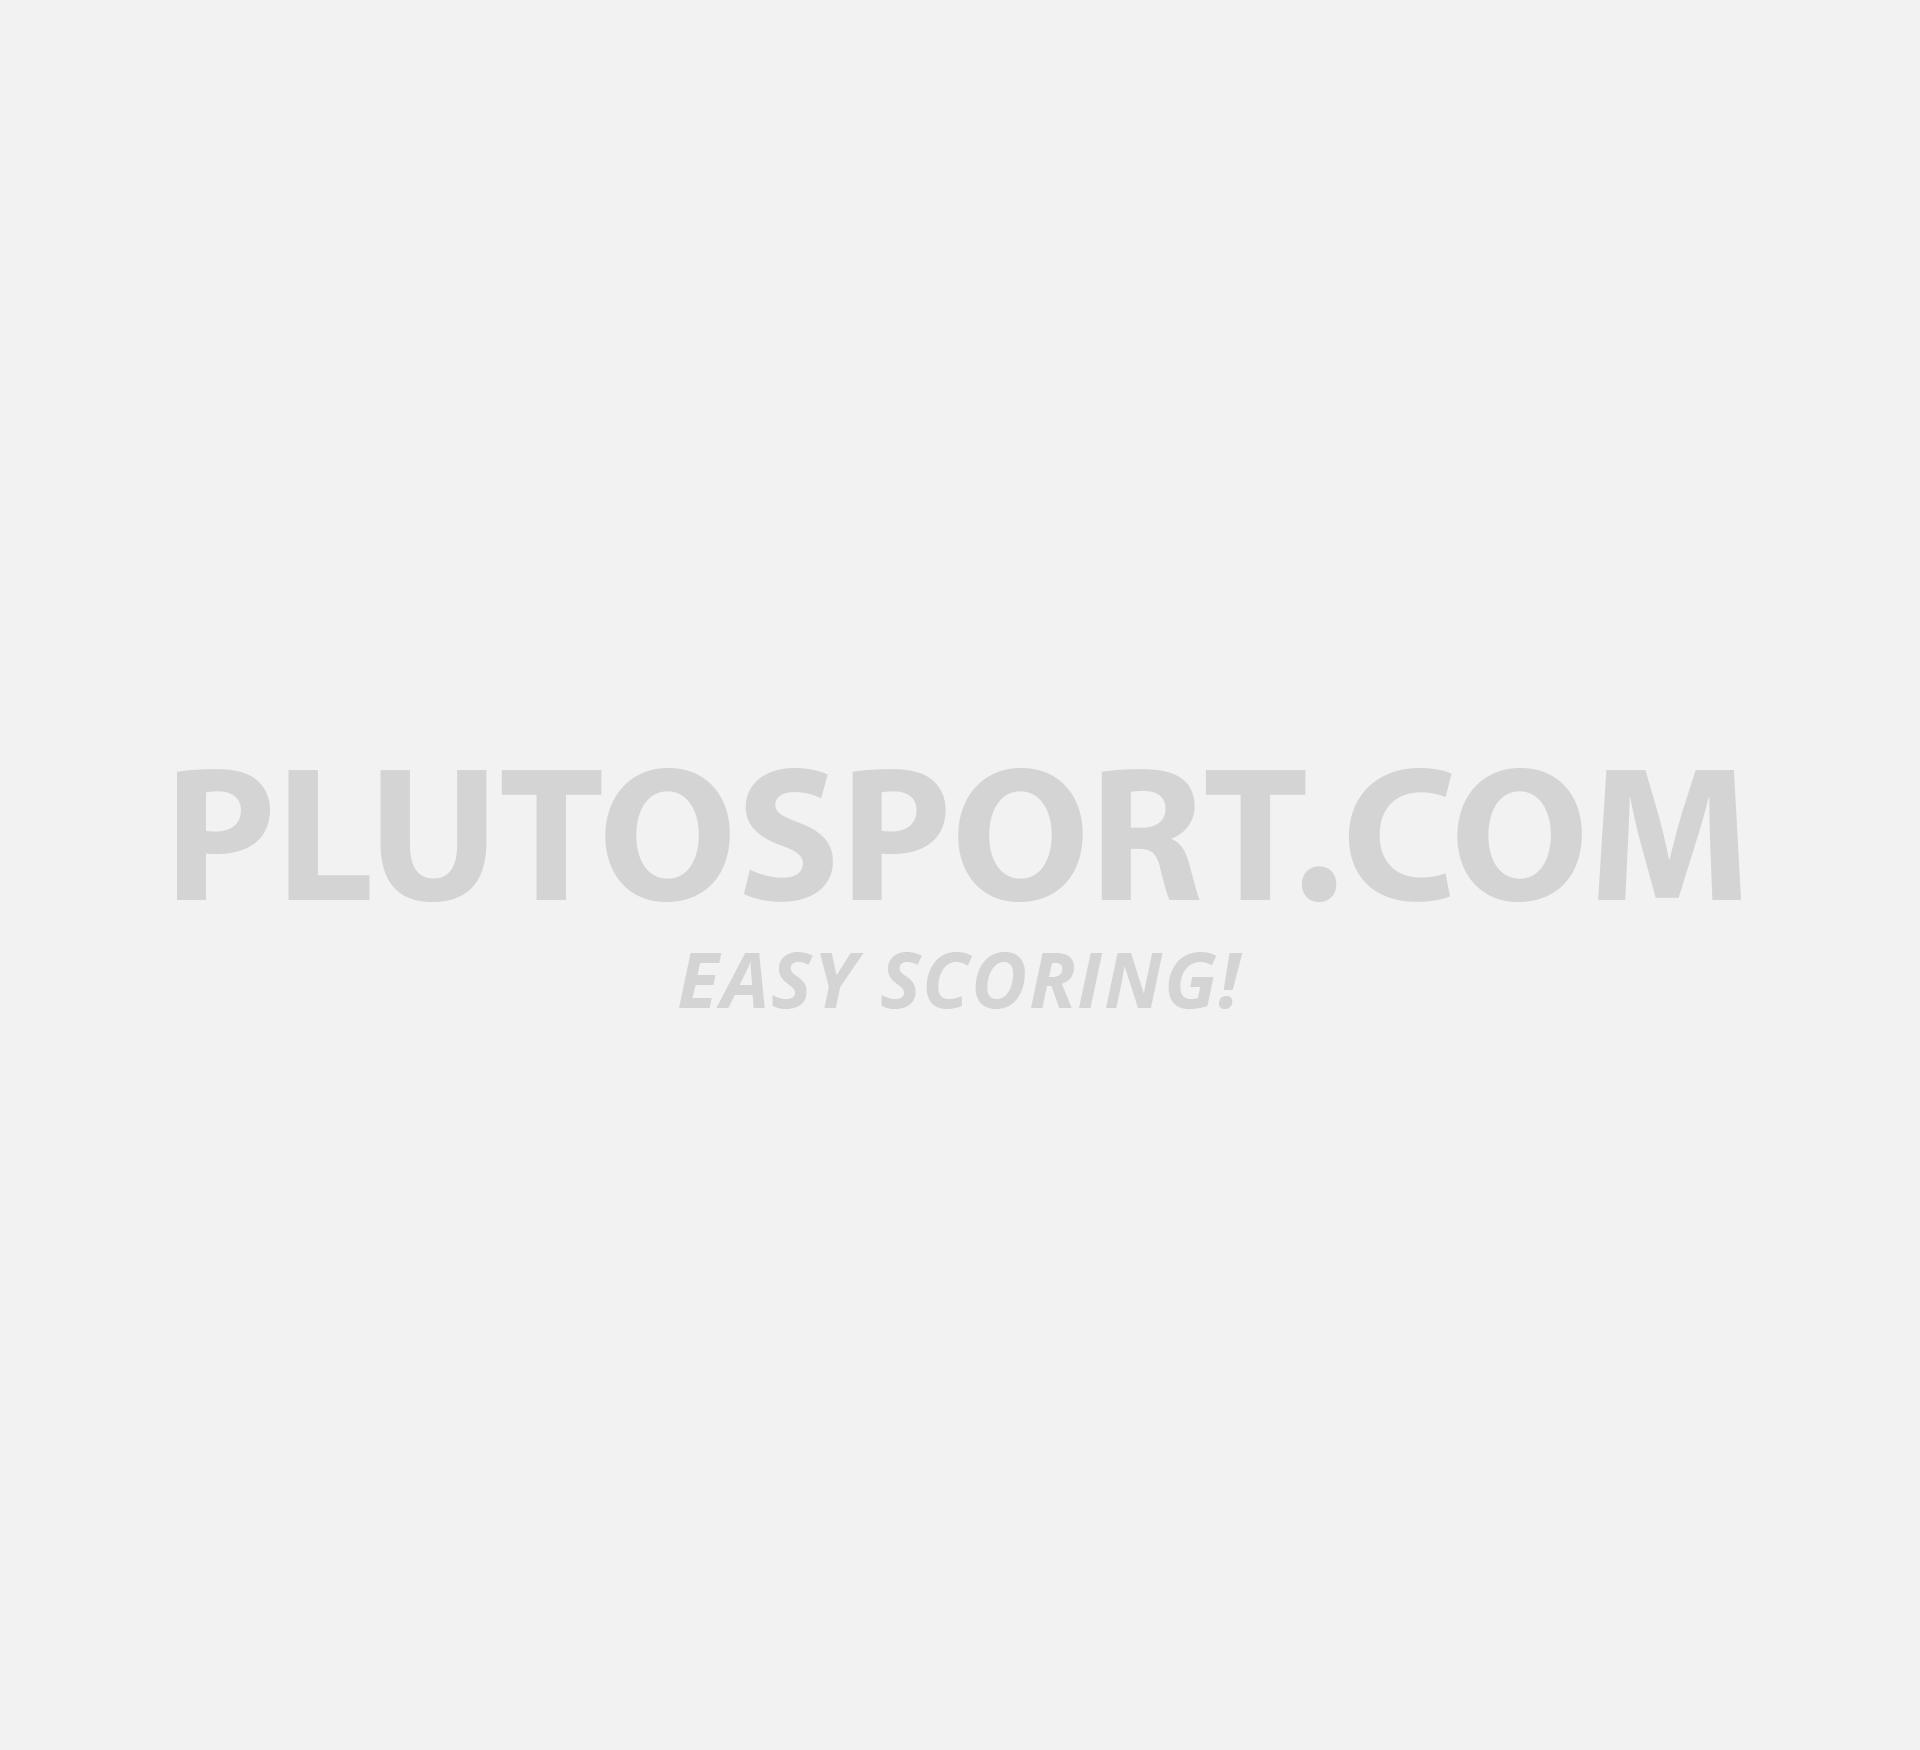 96e7b9257c8 Adidas Estro 15 Jersey Junior - Shortsleeves - Shirts - Clothing - Football  - Teamwear